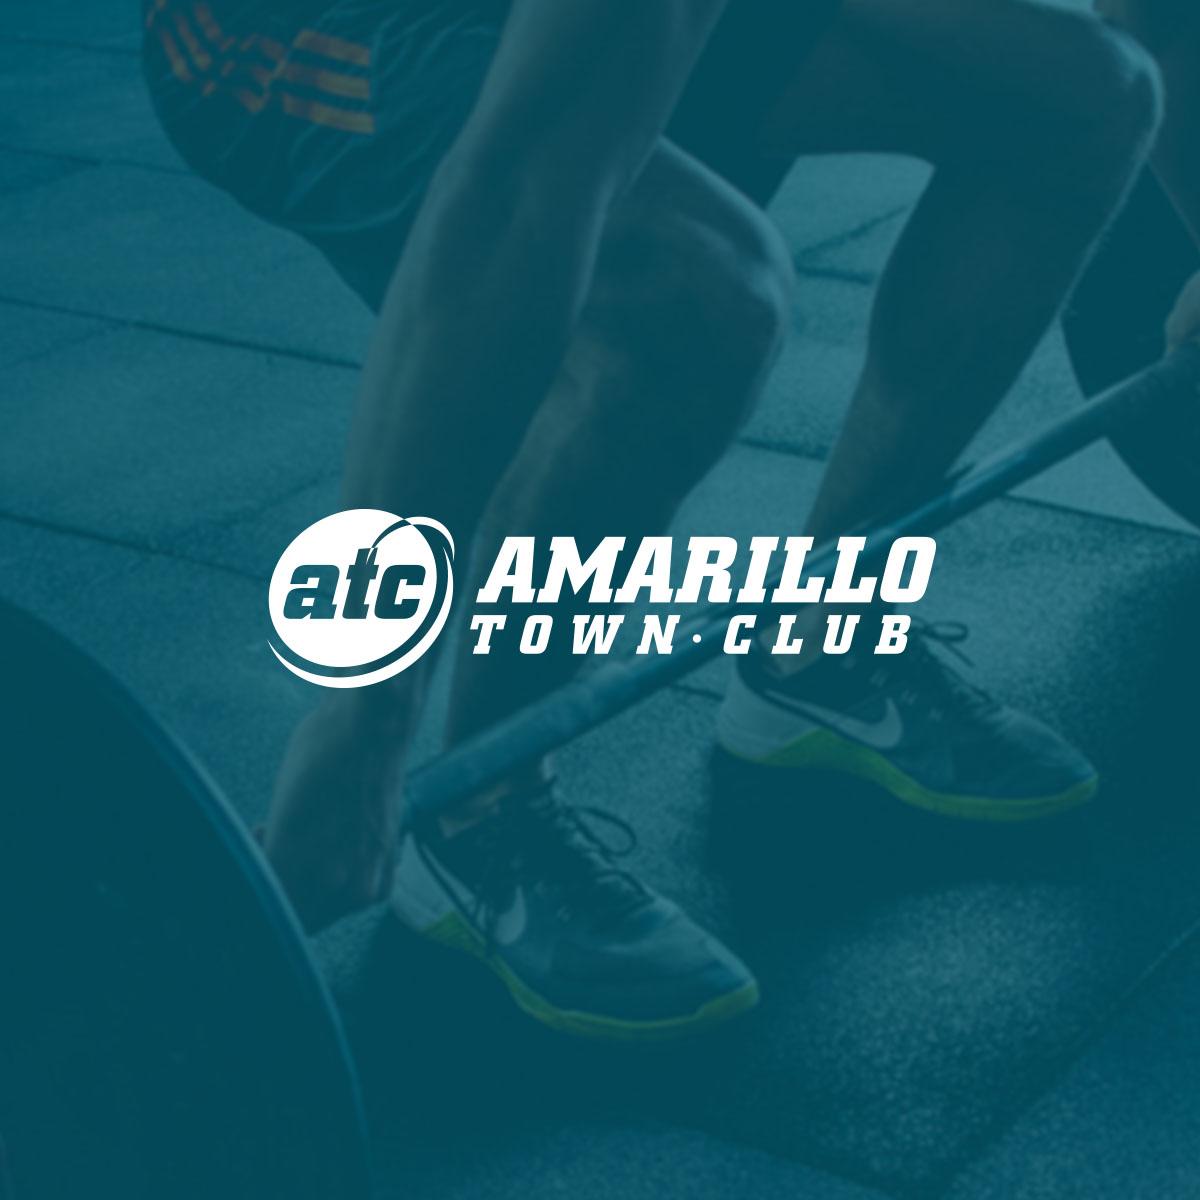 Amarillo Town Club